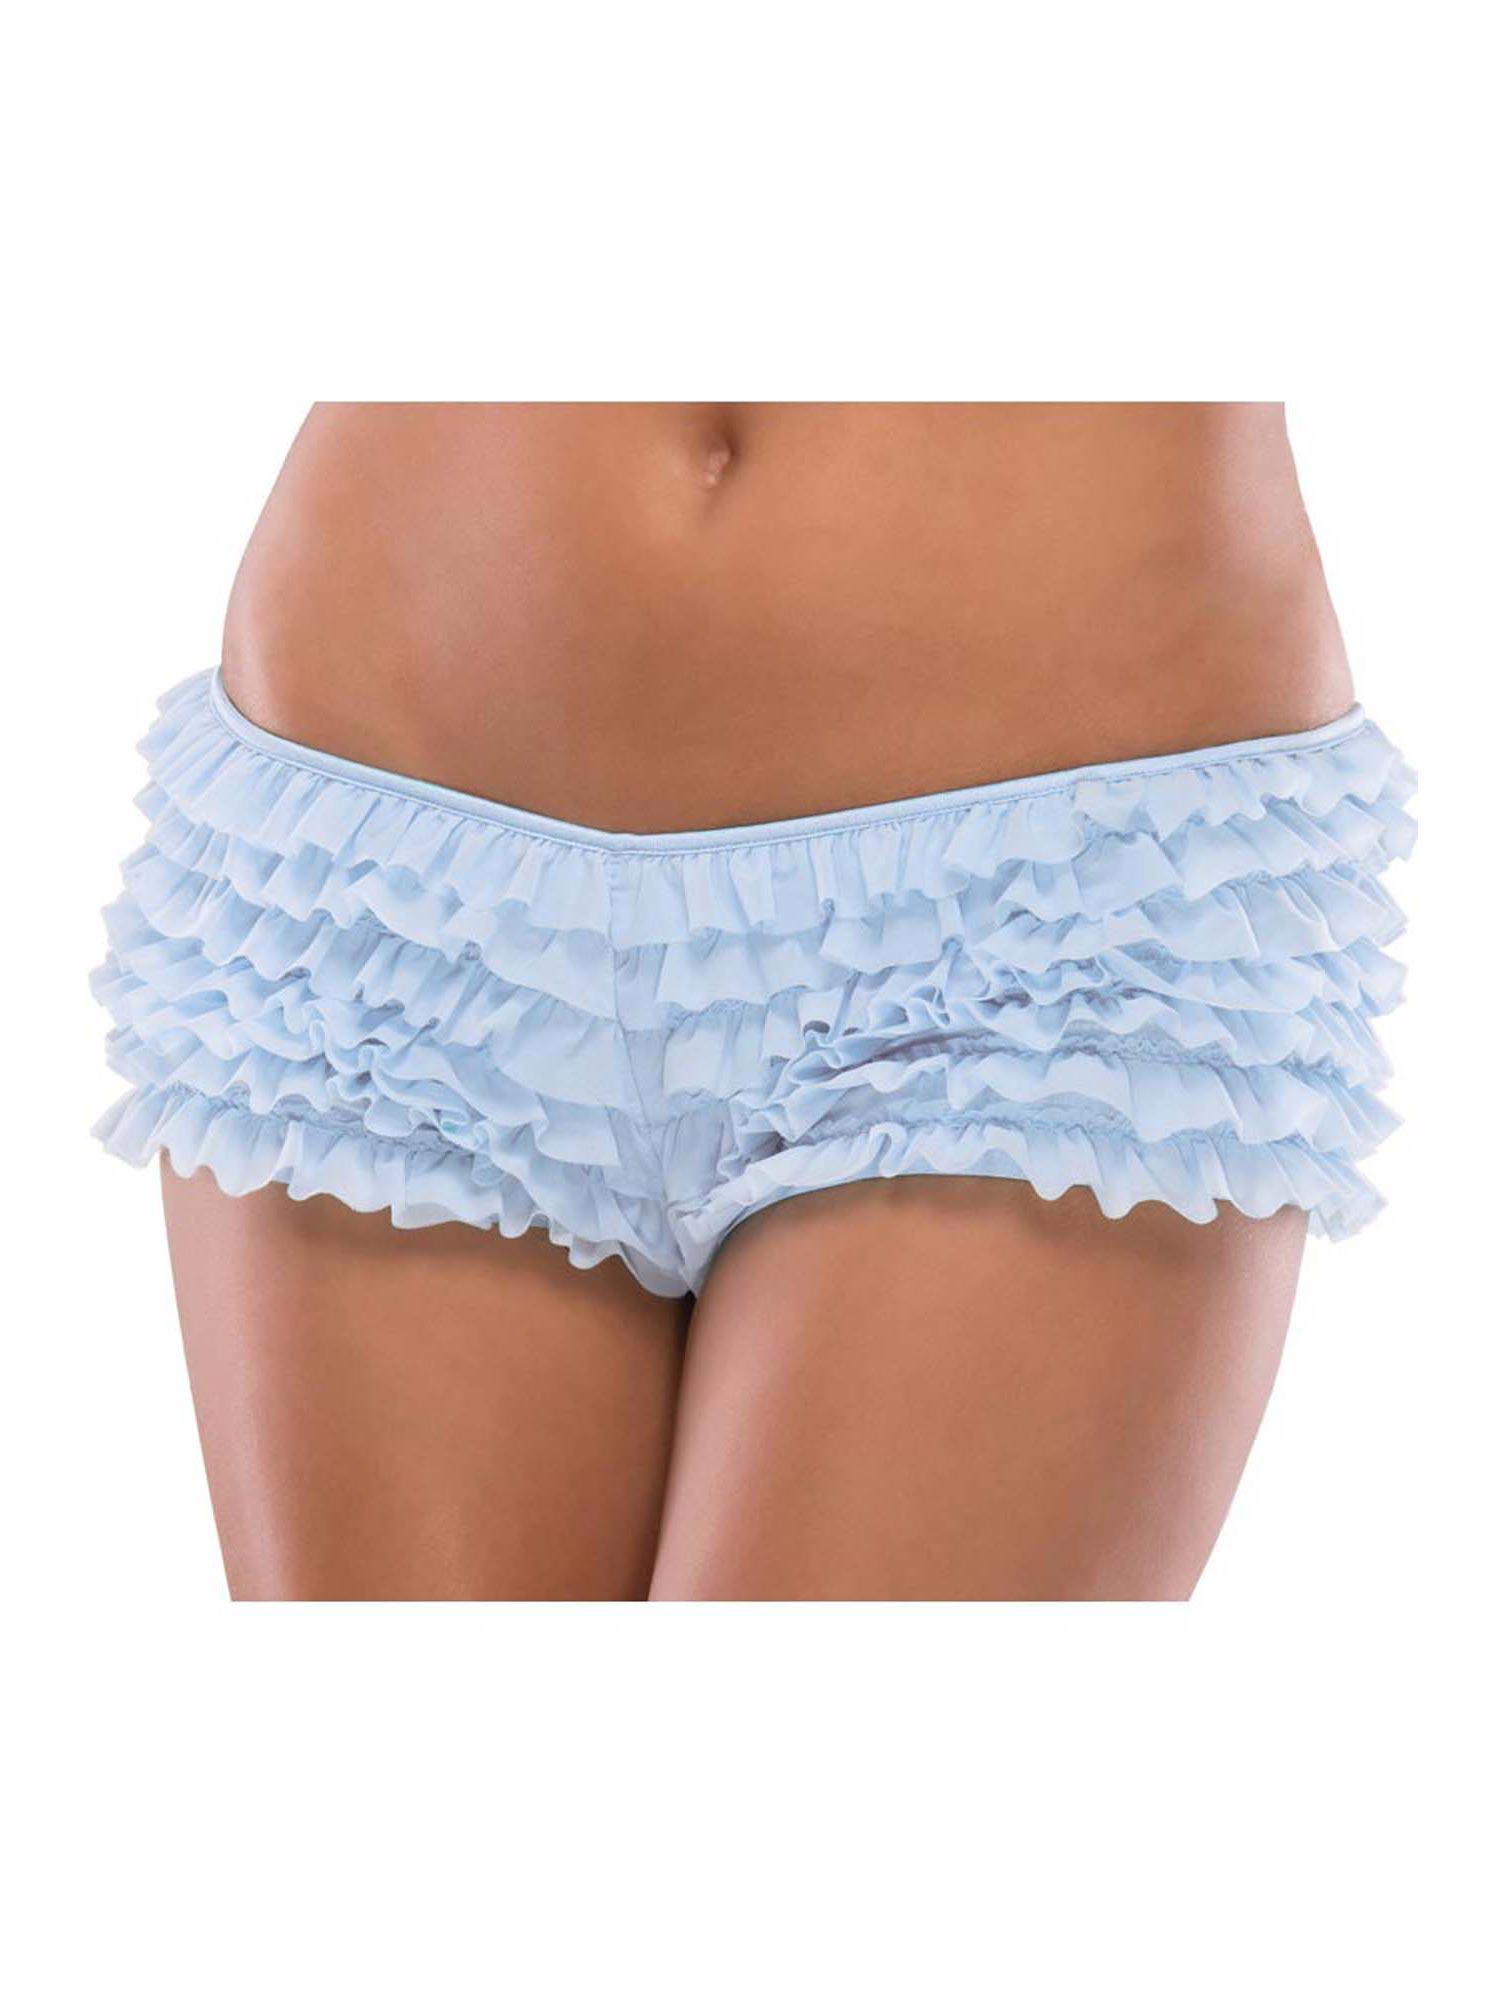 Full Figure Panties 54